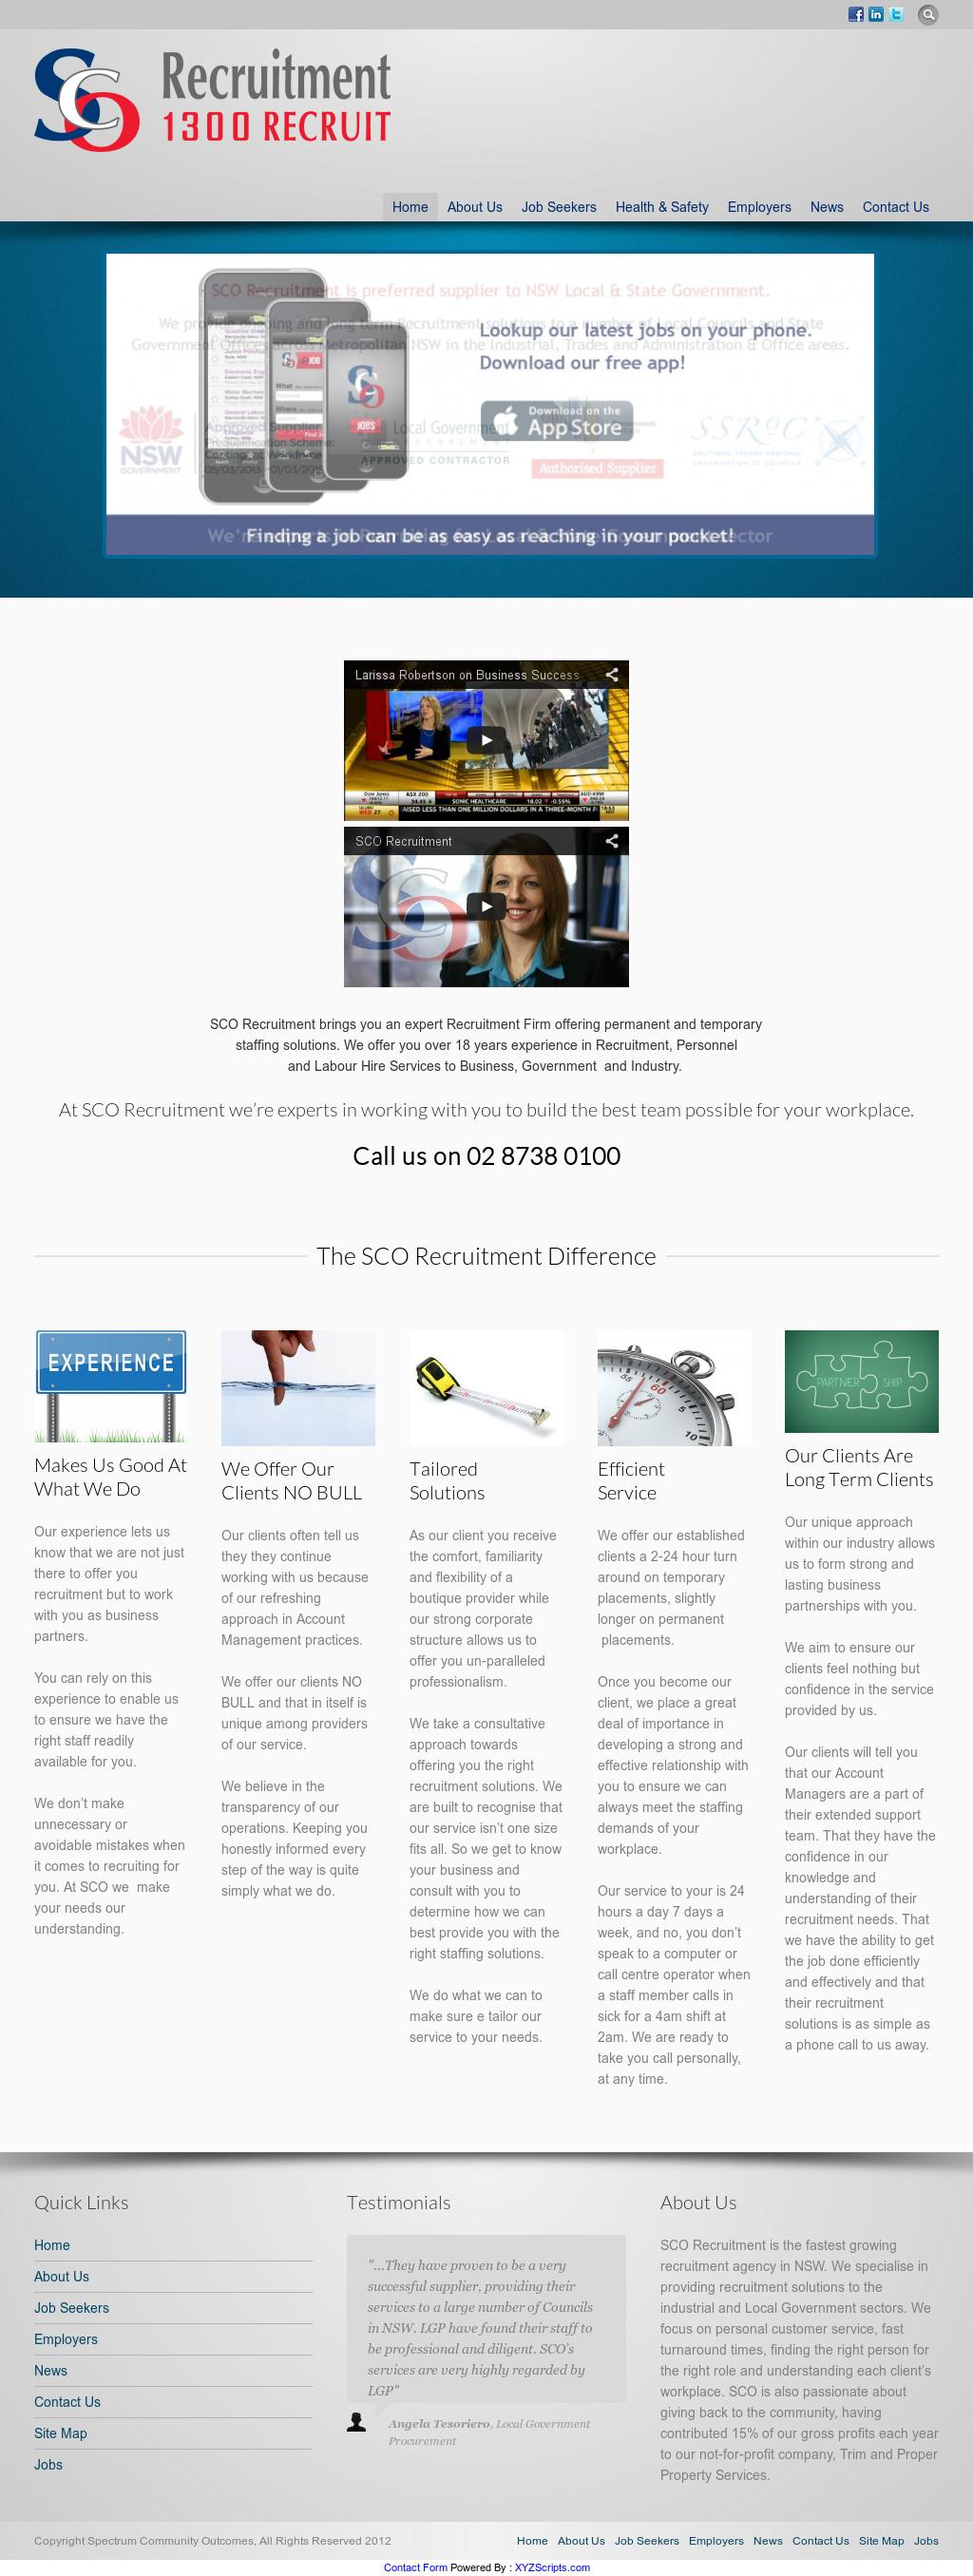 Sco Recruitment Competitors, Revenue and Employees - Owler